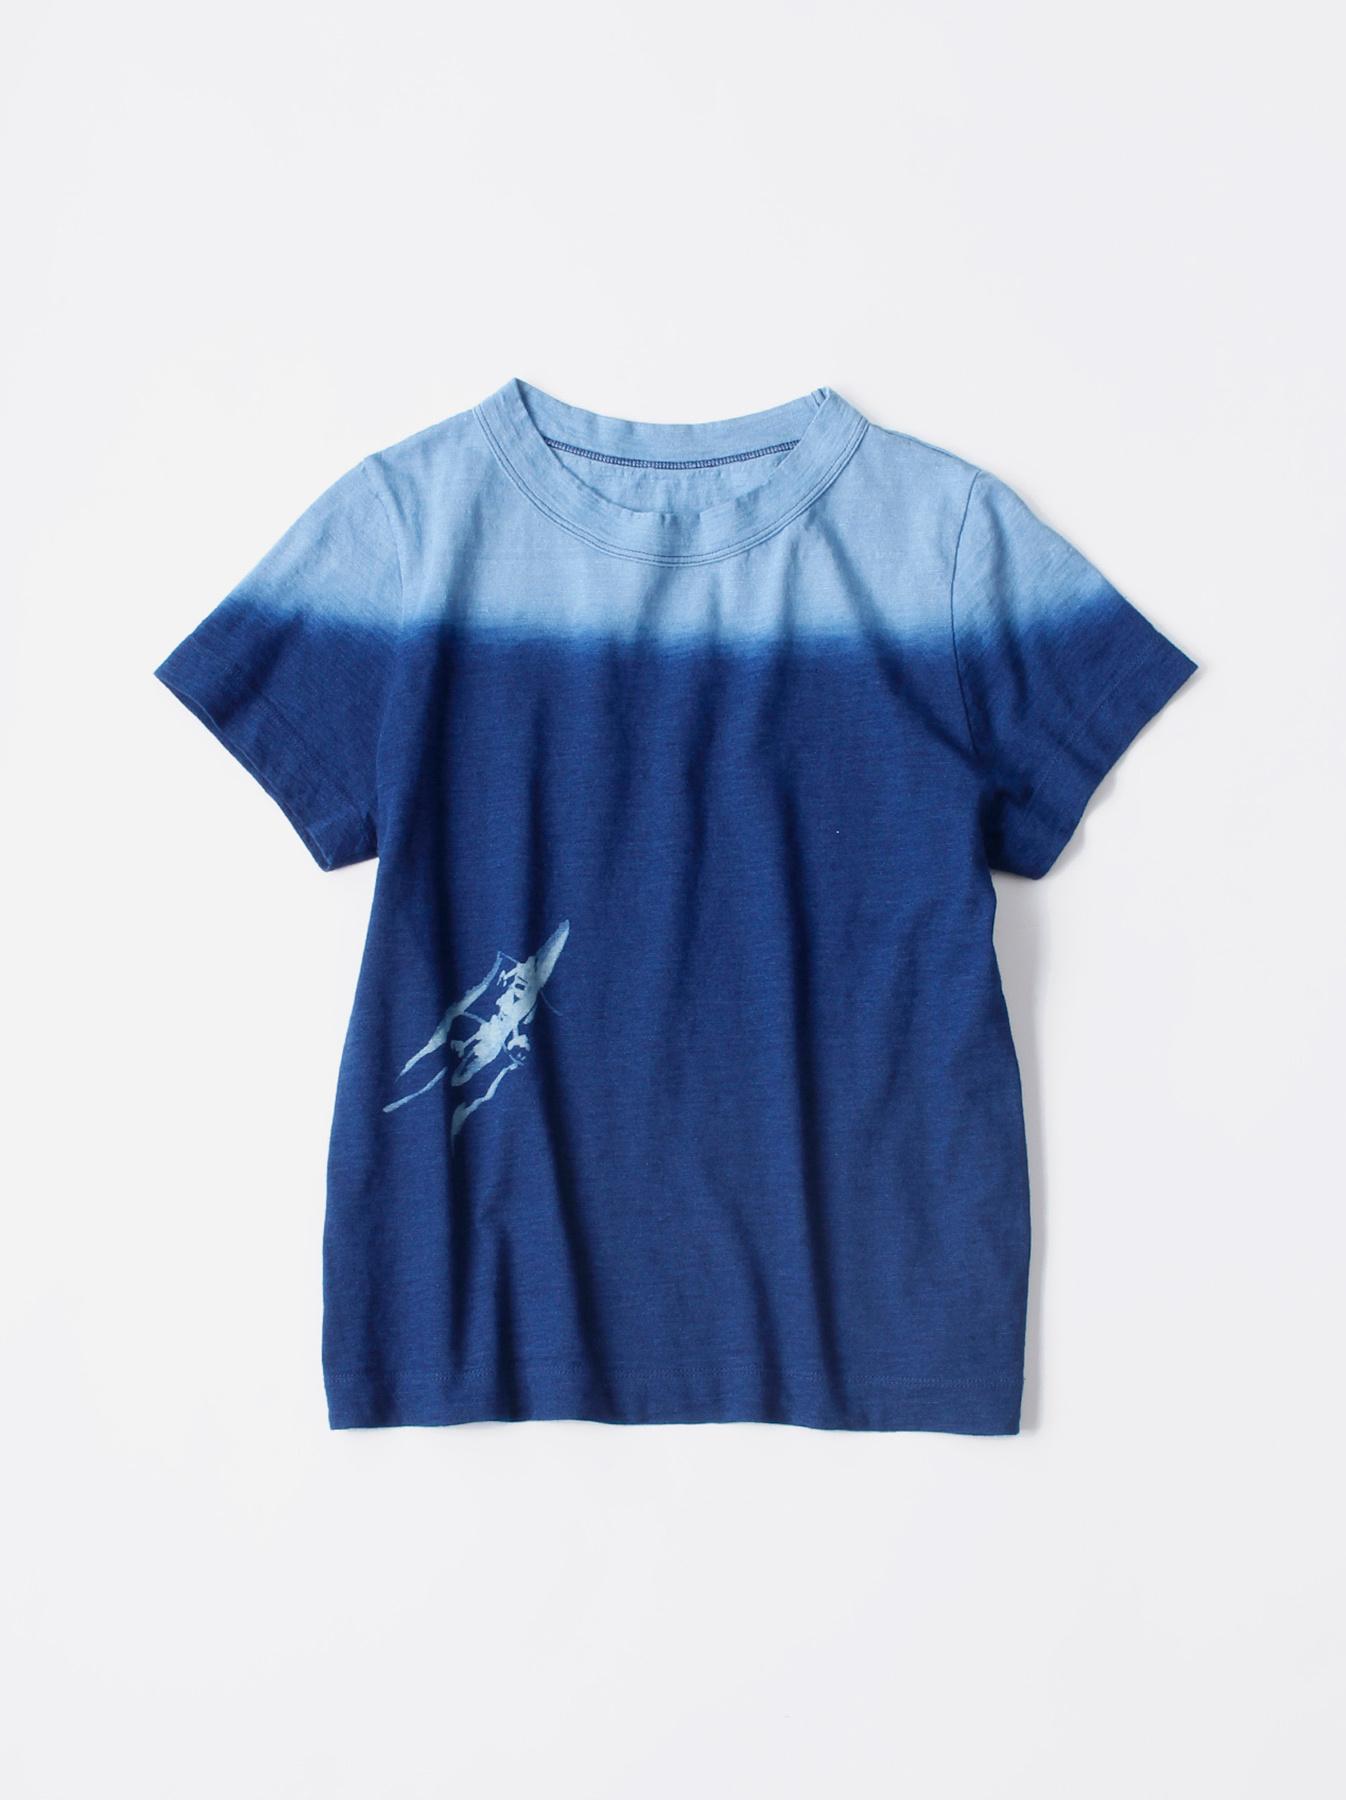 WH Indigo Ukiyo-e Kayak 45 Star T-shirt (Womens)-1